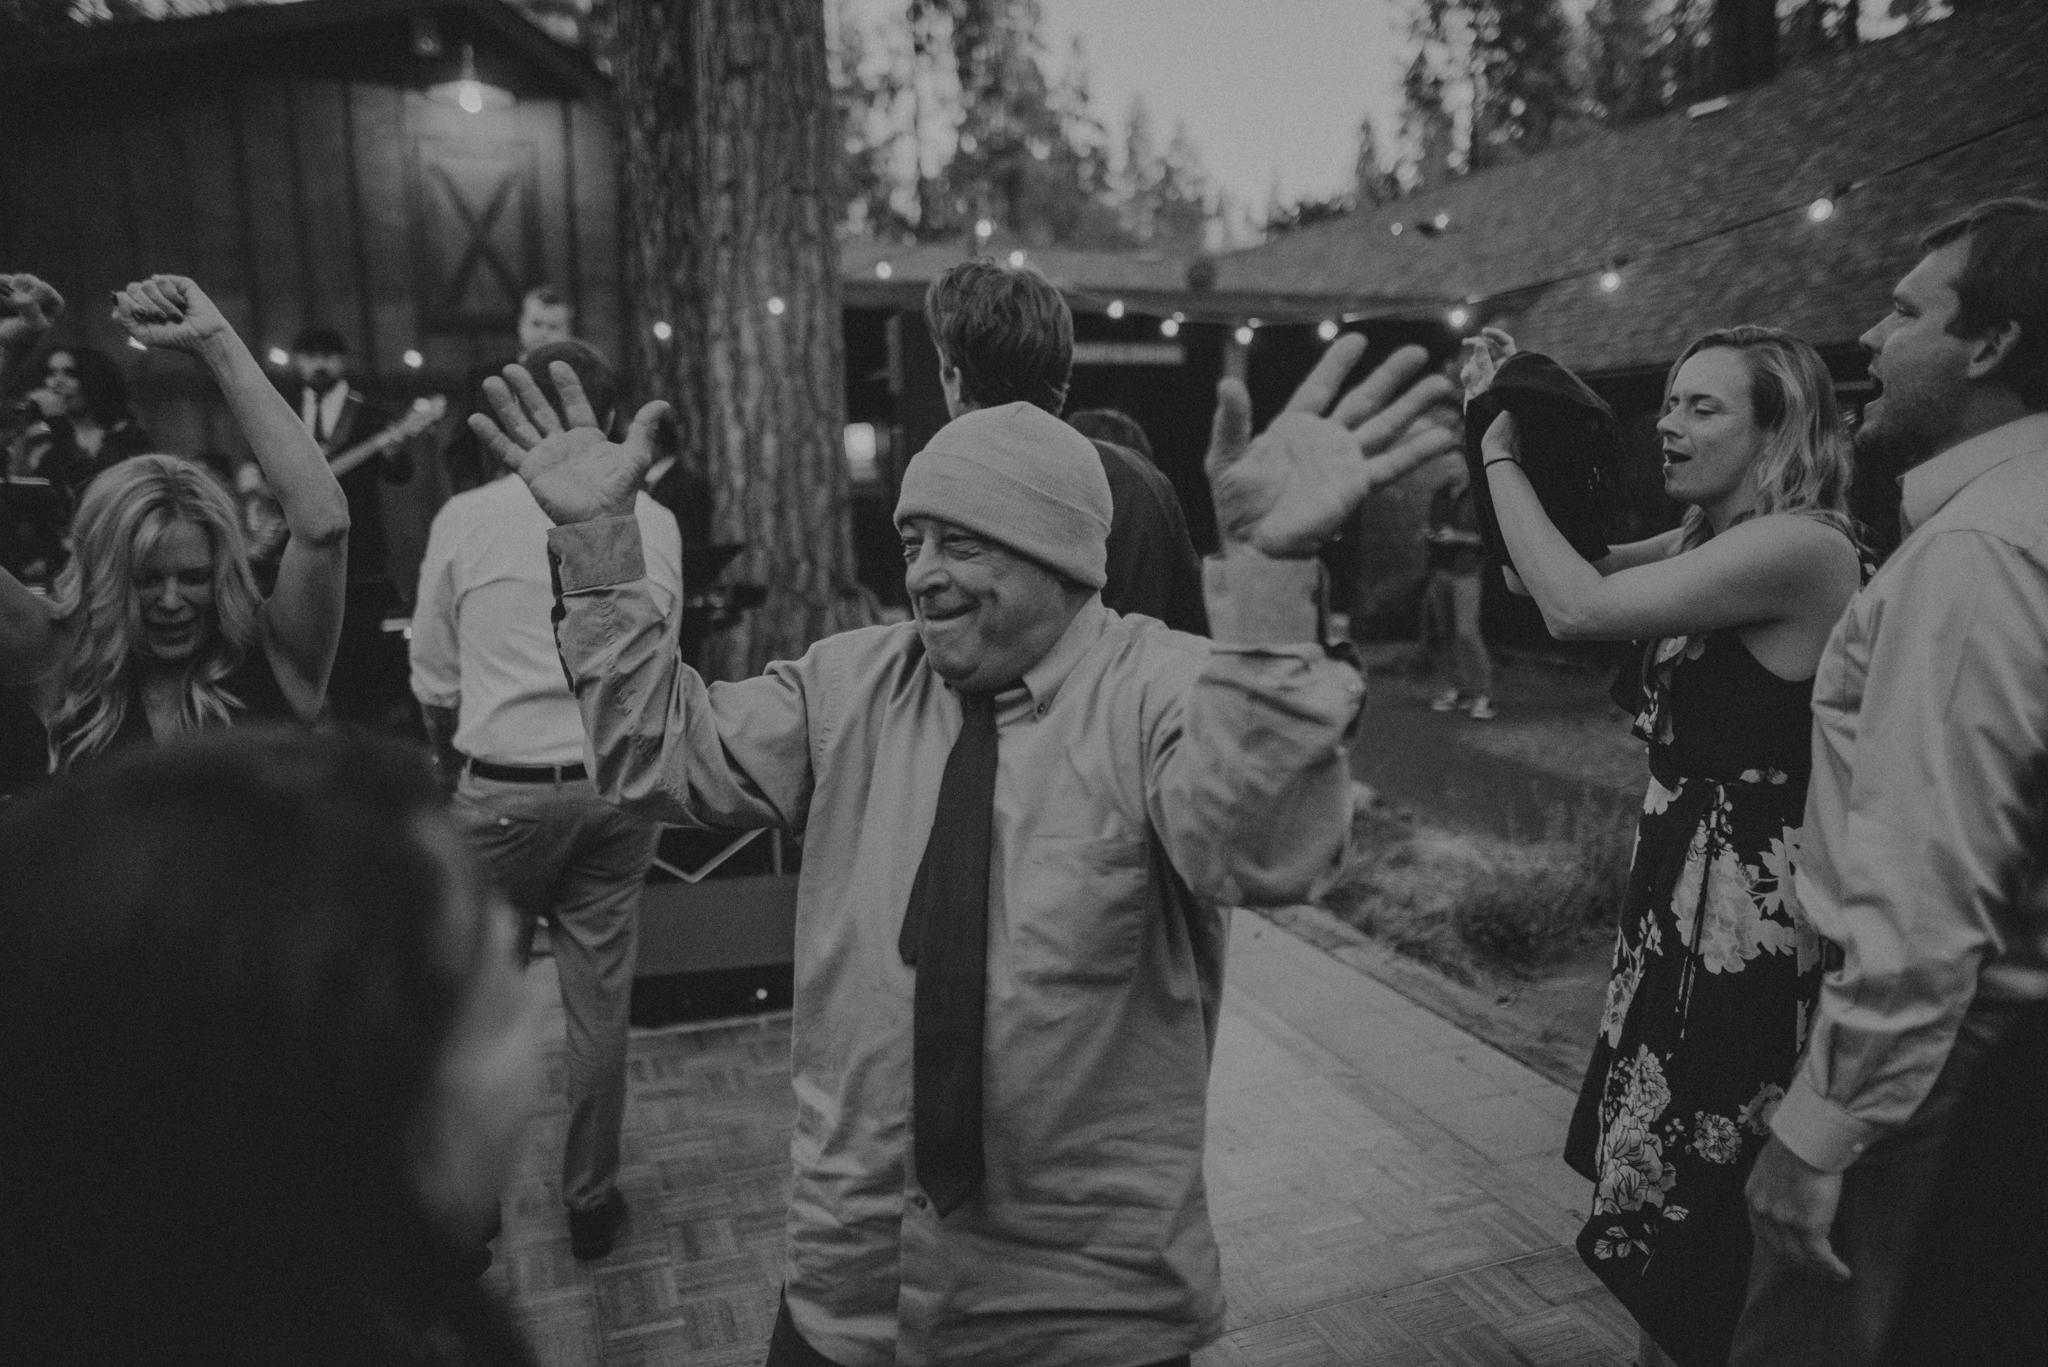 Yosemite Elopement Photographer - Evergreen Lodge Wedding Photographer - IsaiahAndTaylor.com-140.jpg